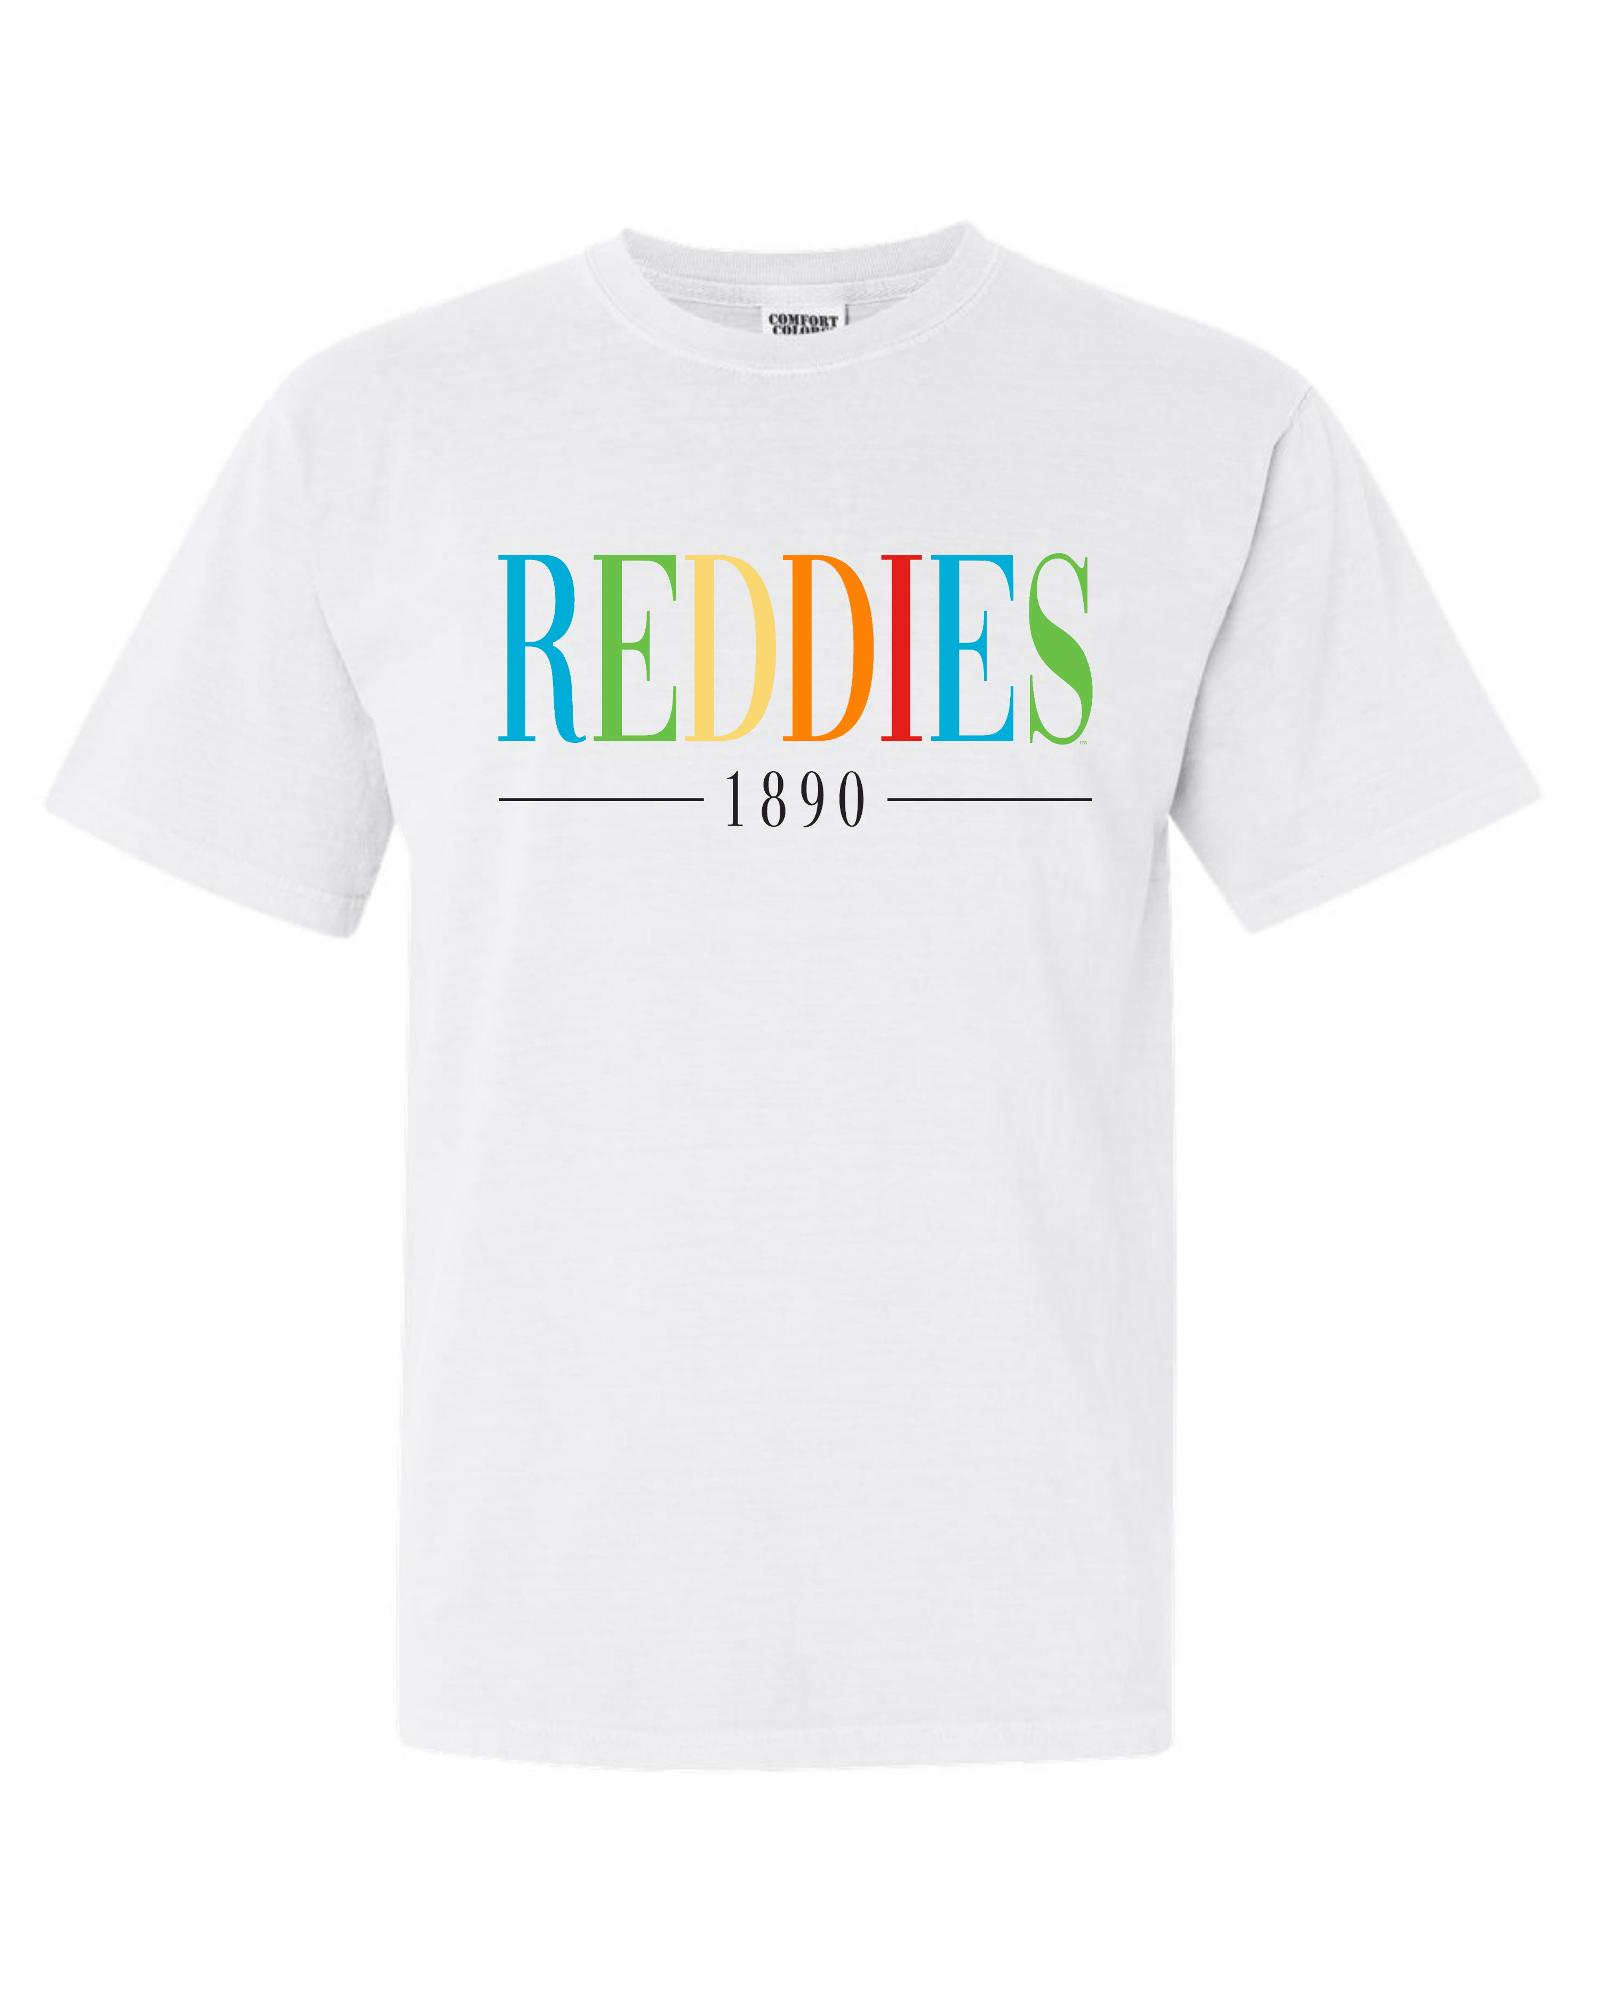 image of: Reddies 1890 Comfort Colors Short Sleeve T-Shirt